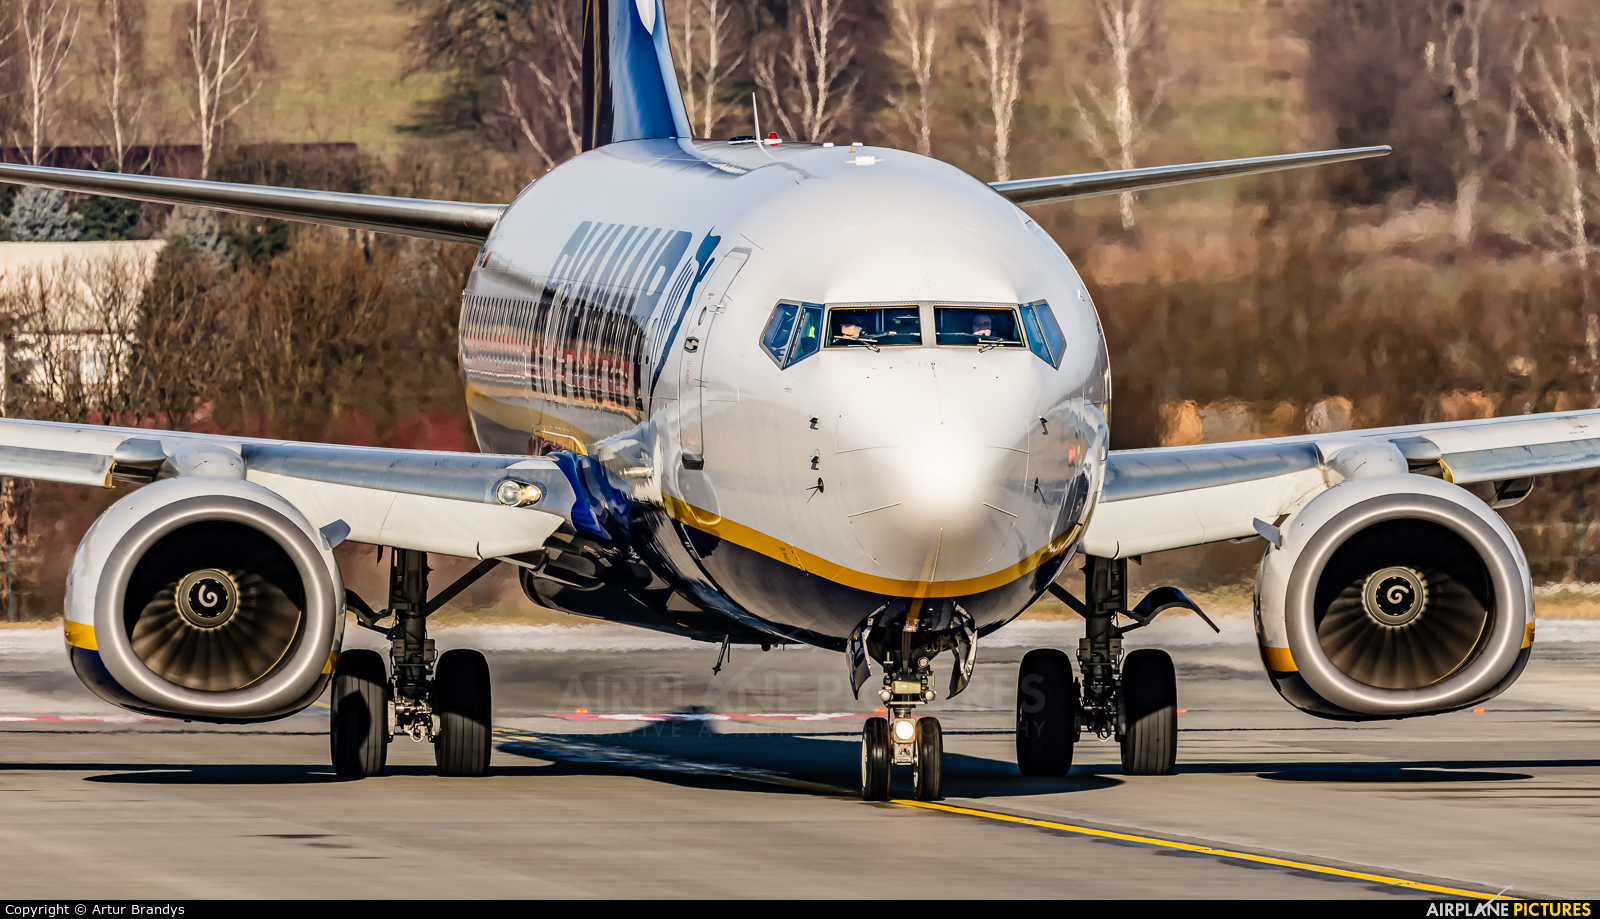 Ryanair Sun SP-RSZ aircraft at Kraków - John Paul II Intl